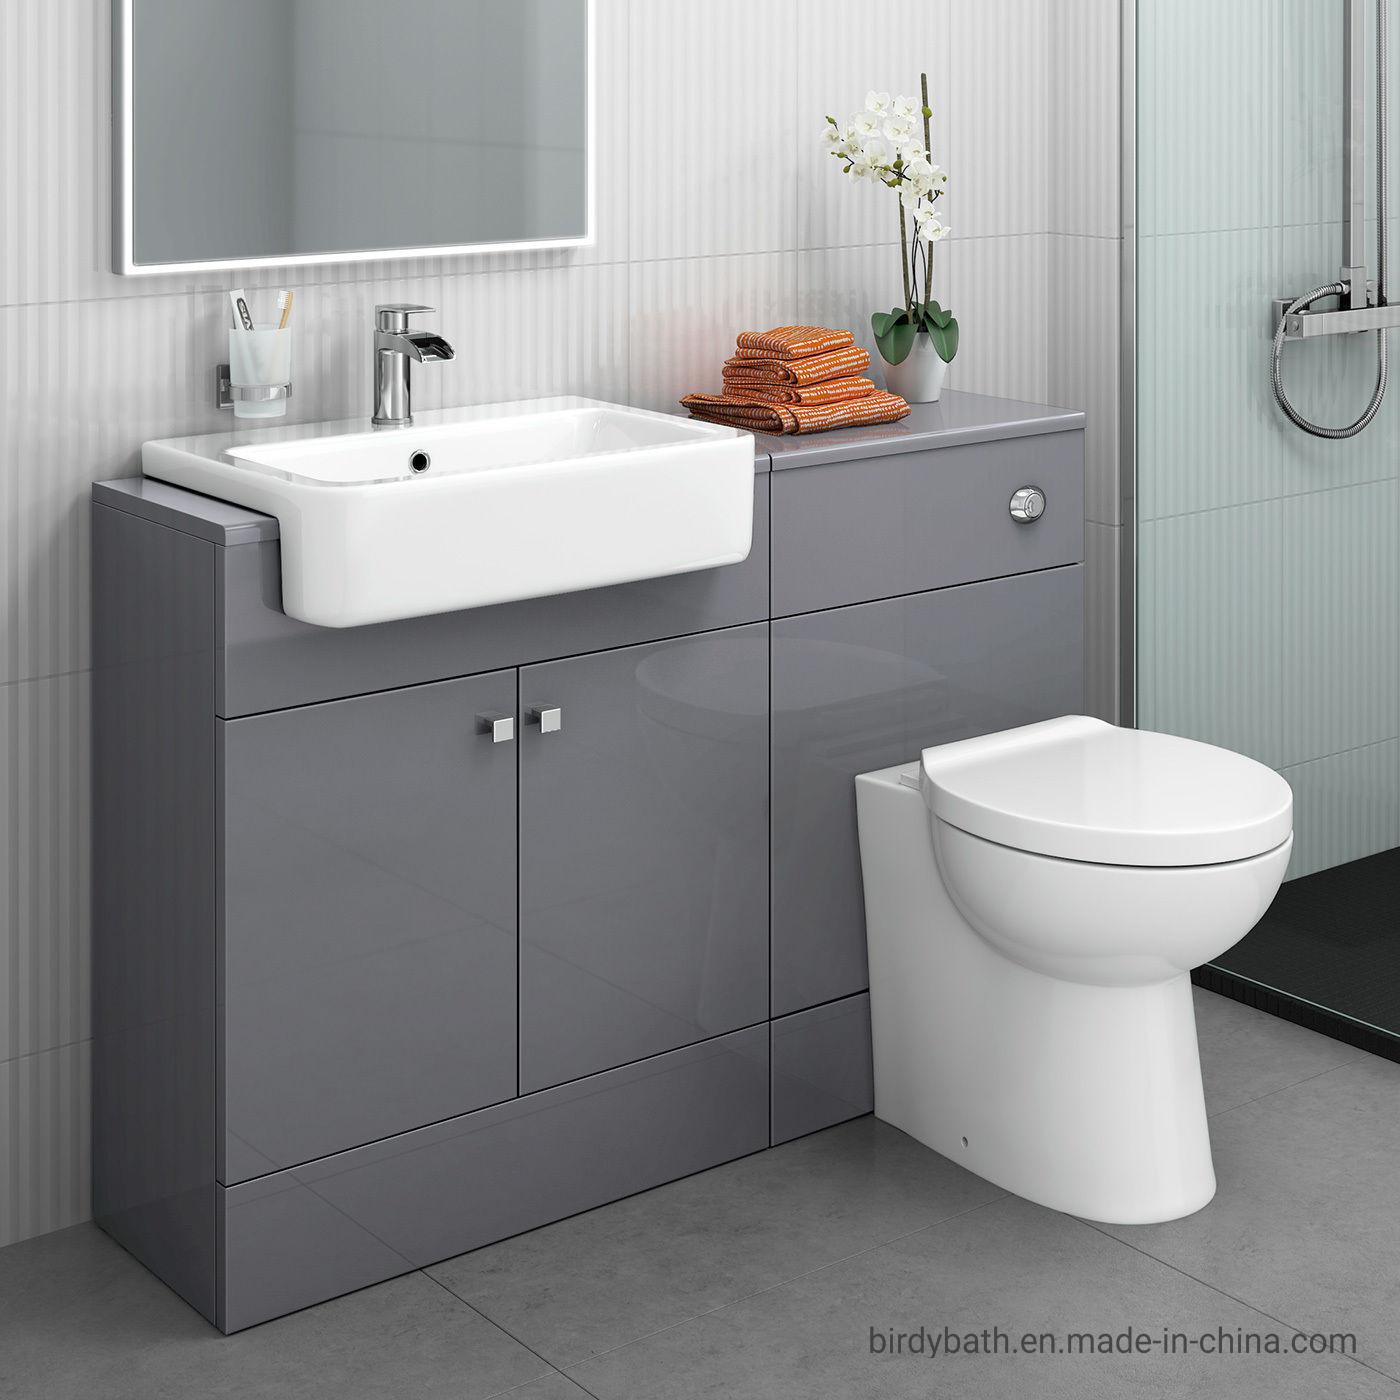 China Bathroom Toilet And Furniture Storage Vanity Unit Sink Basin Grey 1167mm China Bathroom Vanity Unit Bathroom Furniture